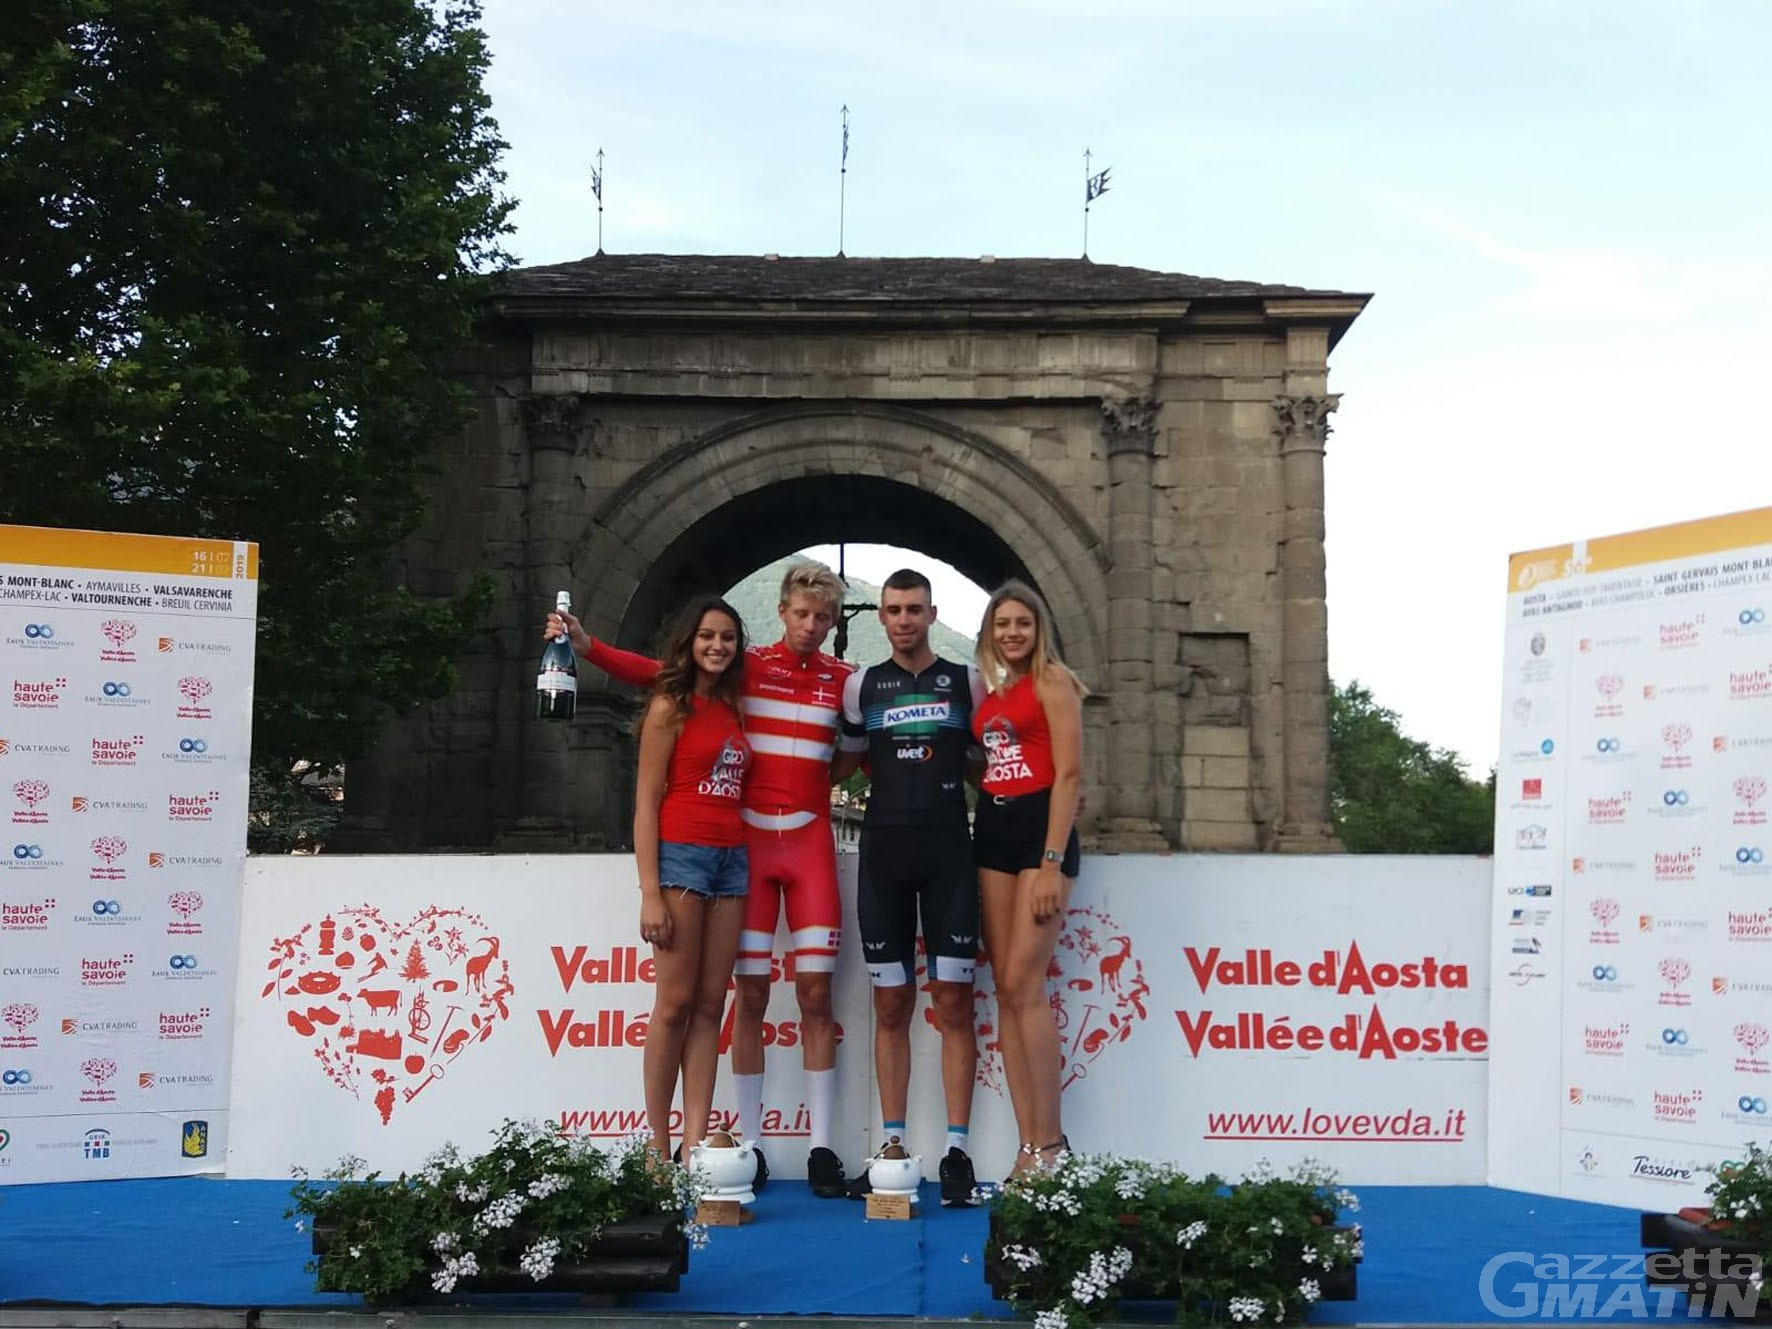 Giro della Valle: la cronoprologo va all'olandese Jacob Hindsgaul Madsen